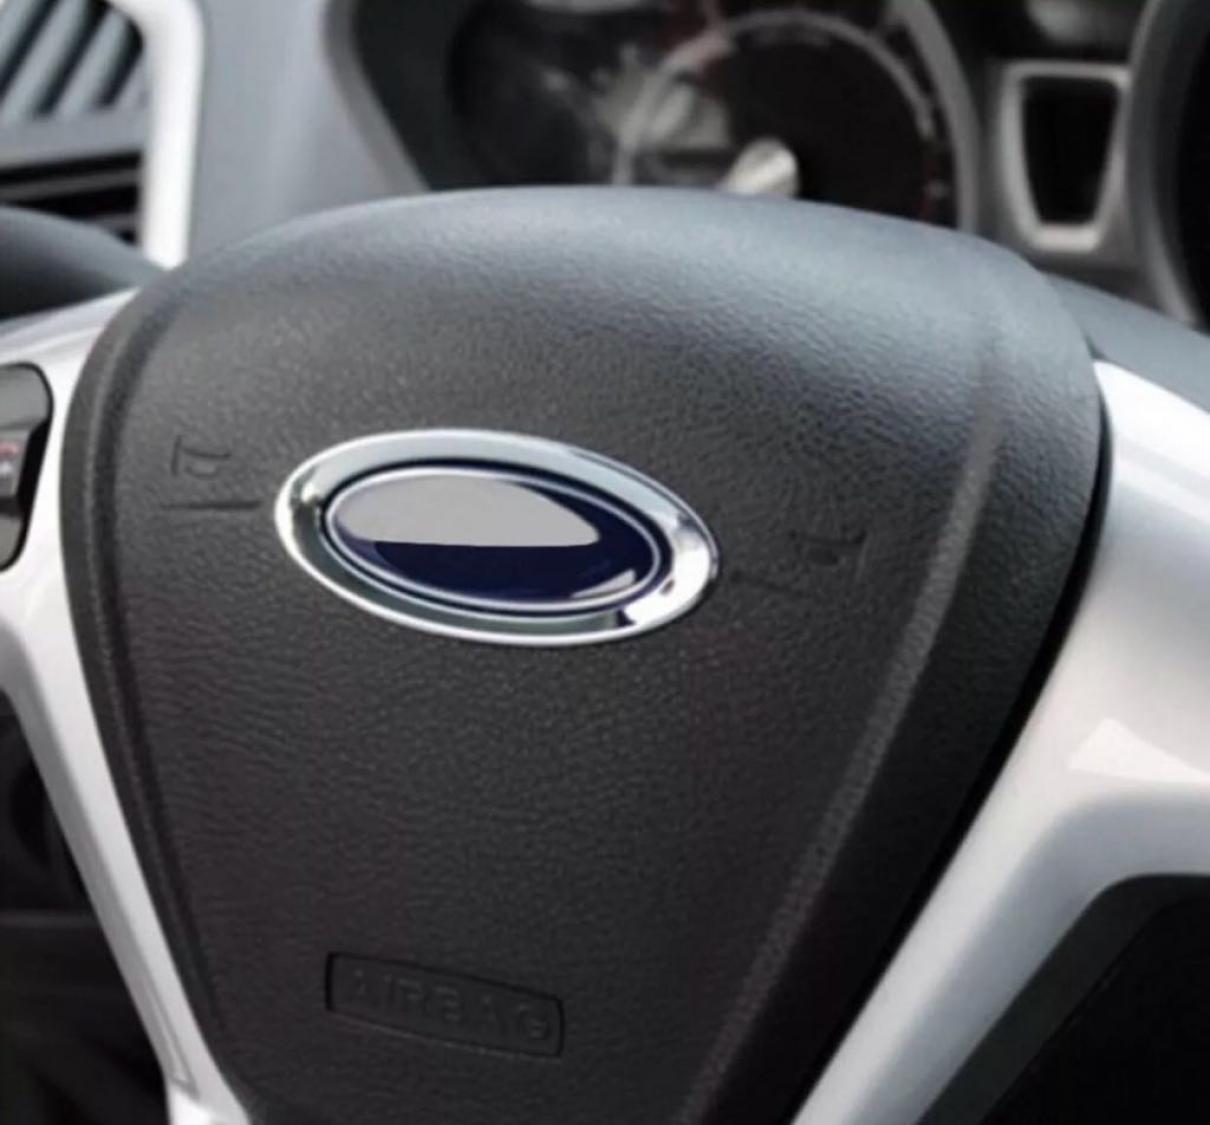 Alu Tachoknopf Tacho knopf Opel Astra Gum